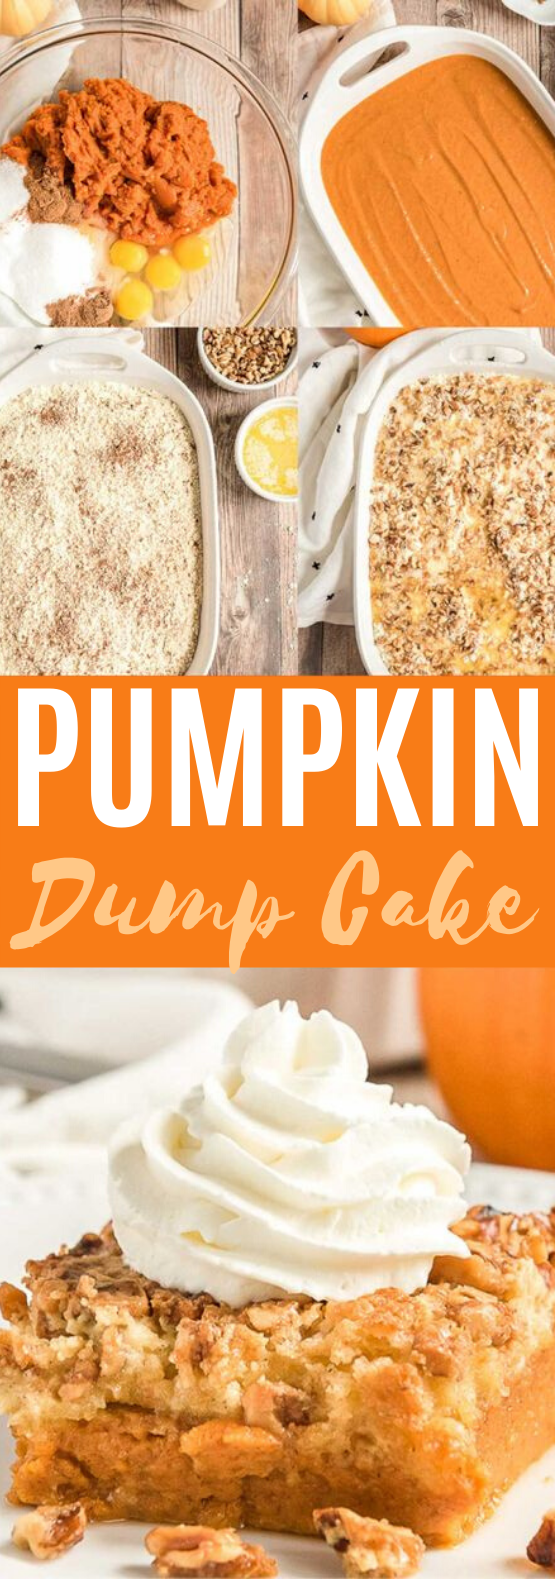 Pumpkin Dump Cake #cake #recipes #baking #desserts #pumpkin